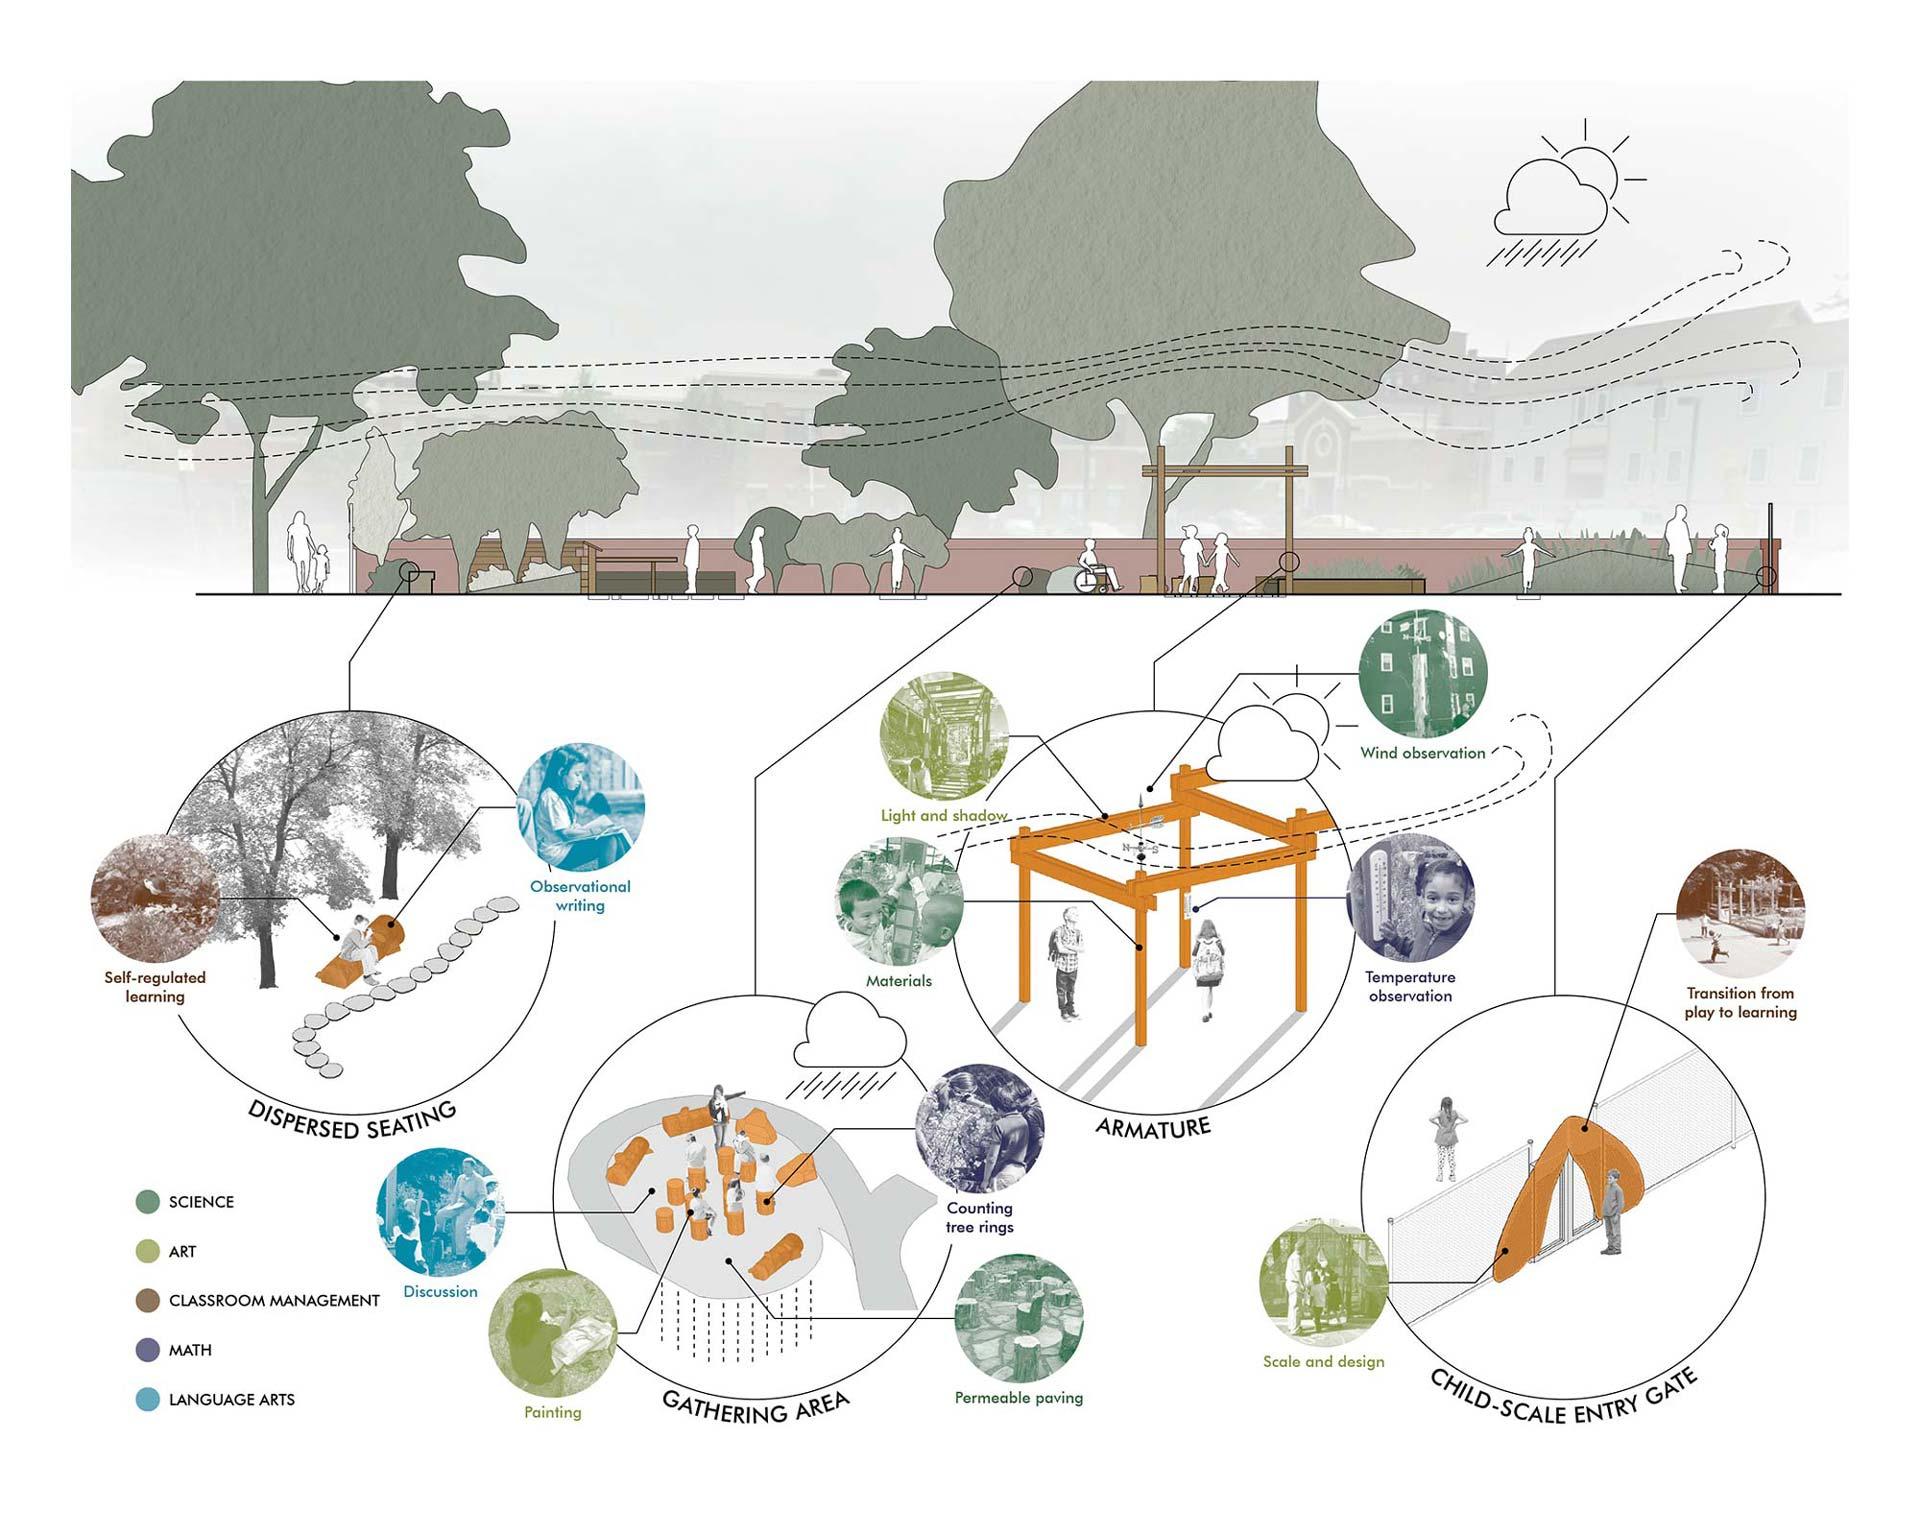 10_Schoolyard-Initiative_Klopfer-Martin-Design-Group_diagram_outdoor-classroom.jpg